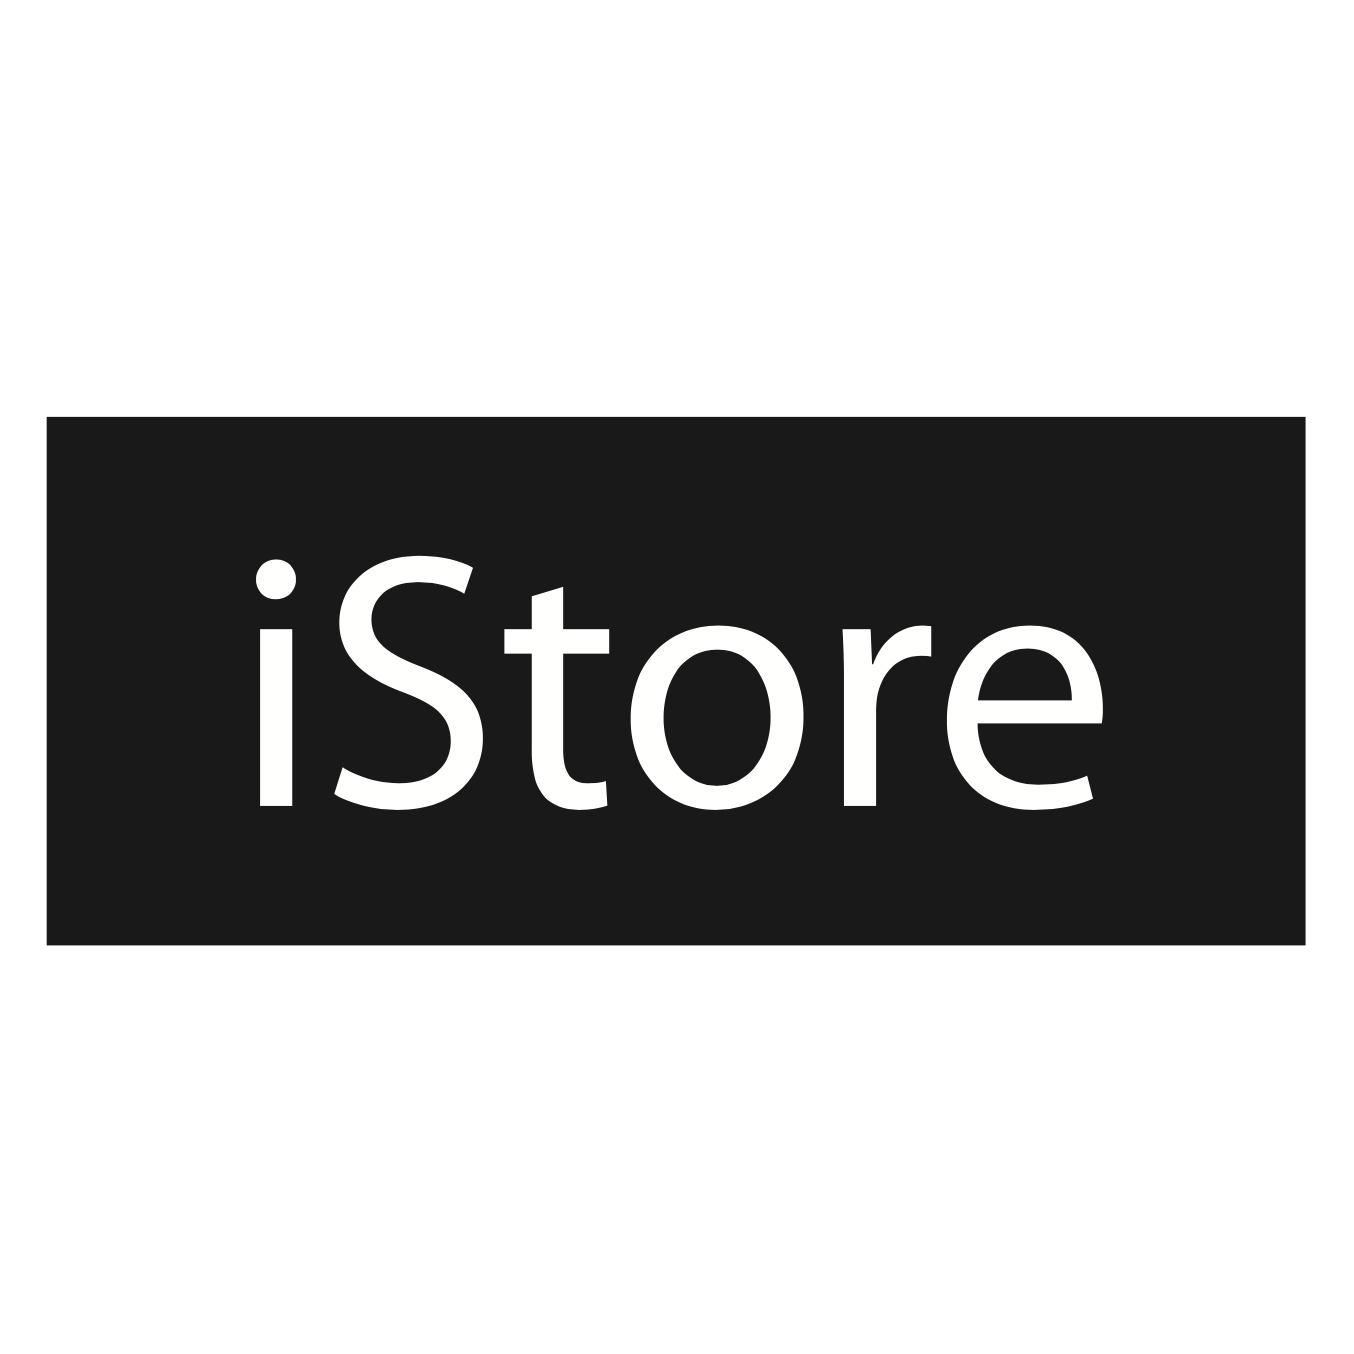 MacBook 13-inch Reform Brief with Tensaerlite  - Grey